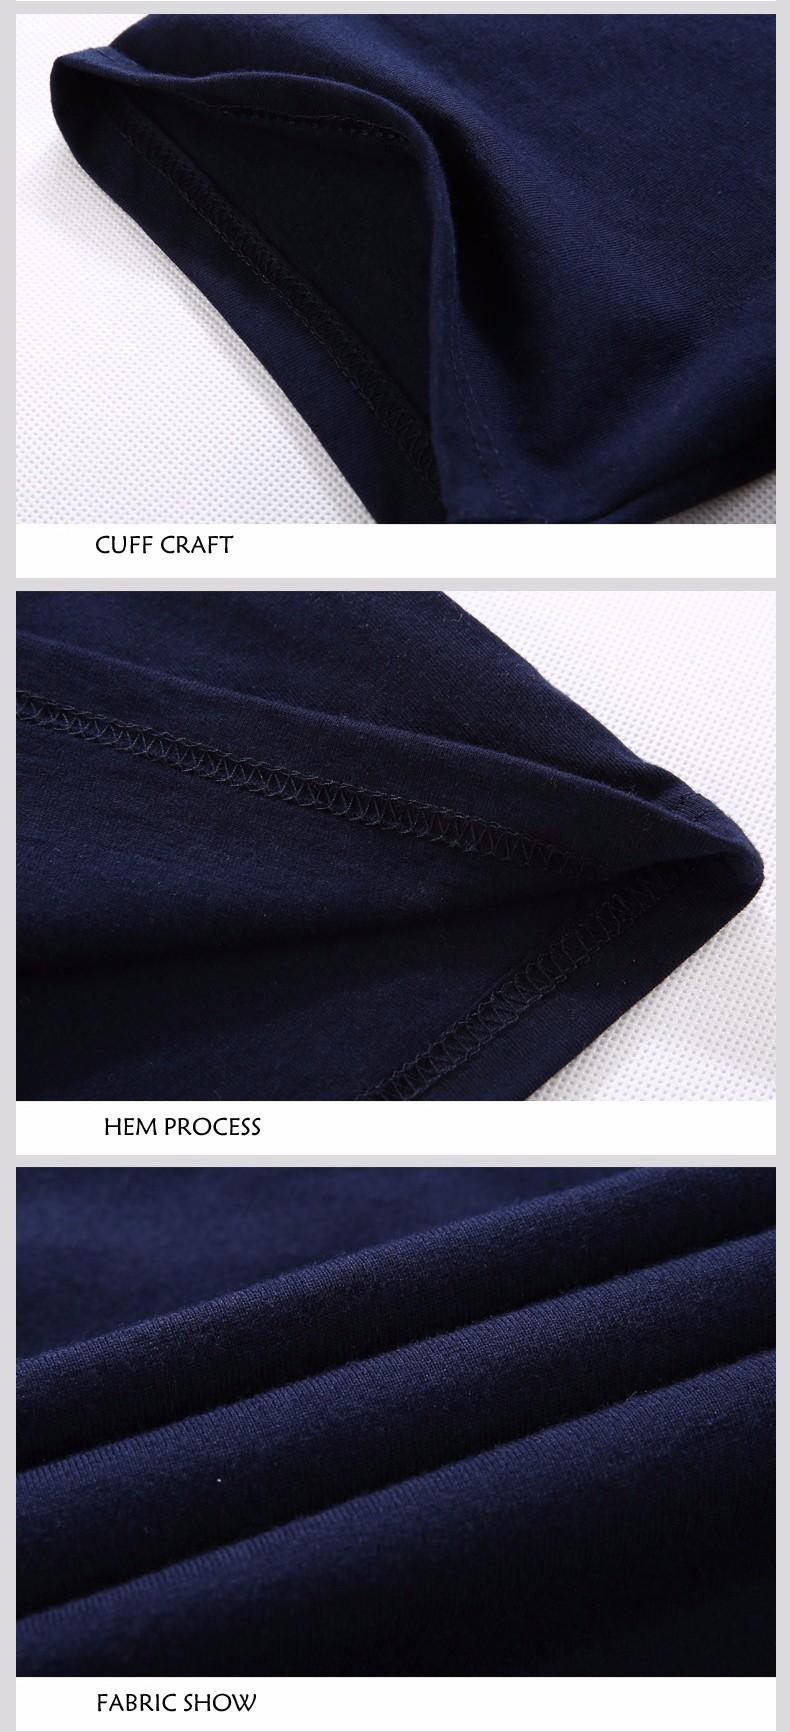 HTB1WdtrMXXXXXcNXpXXq6xXFXXXB - 2017 Summer New 3D T Shirt Men's Short-sleeve Fashion O-Neck animal T-shirt Printed Casual Navy blue Male Shirts Plus size 6XL